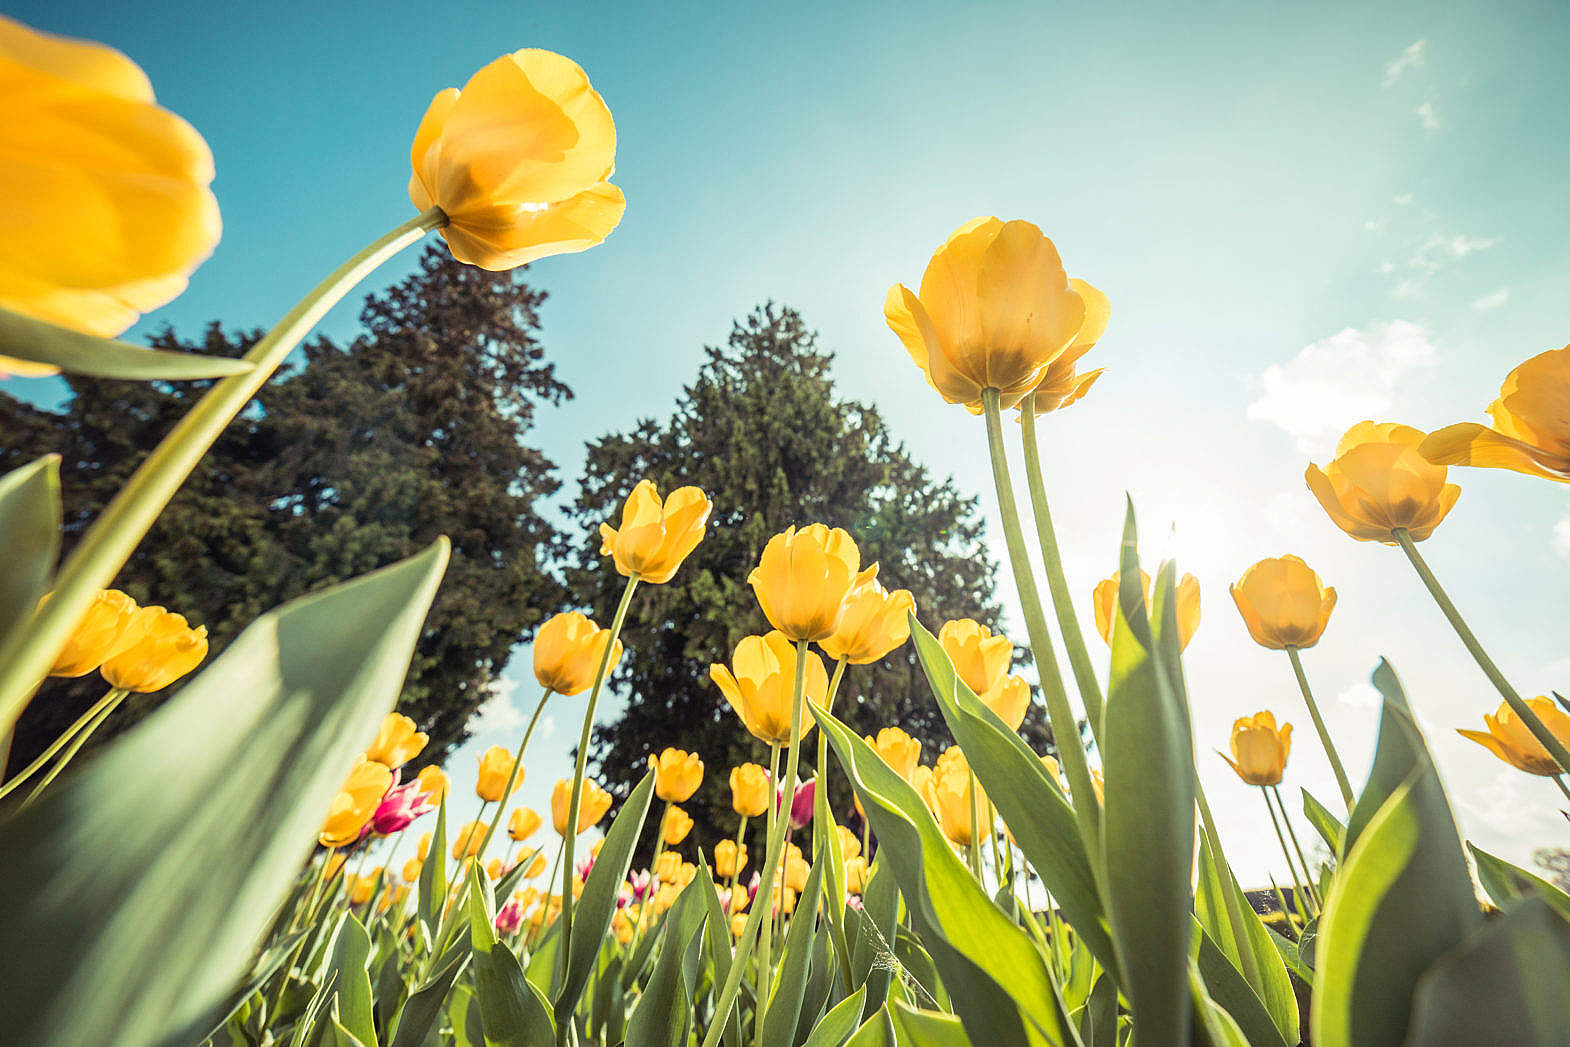 Sunny Spring Day Ahead!